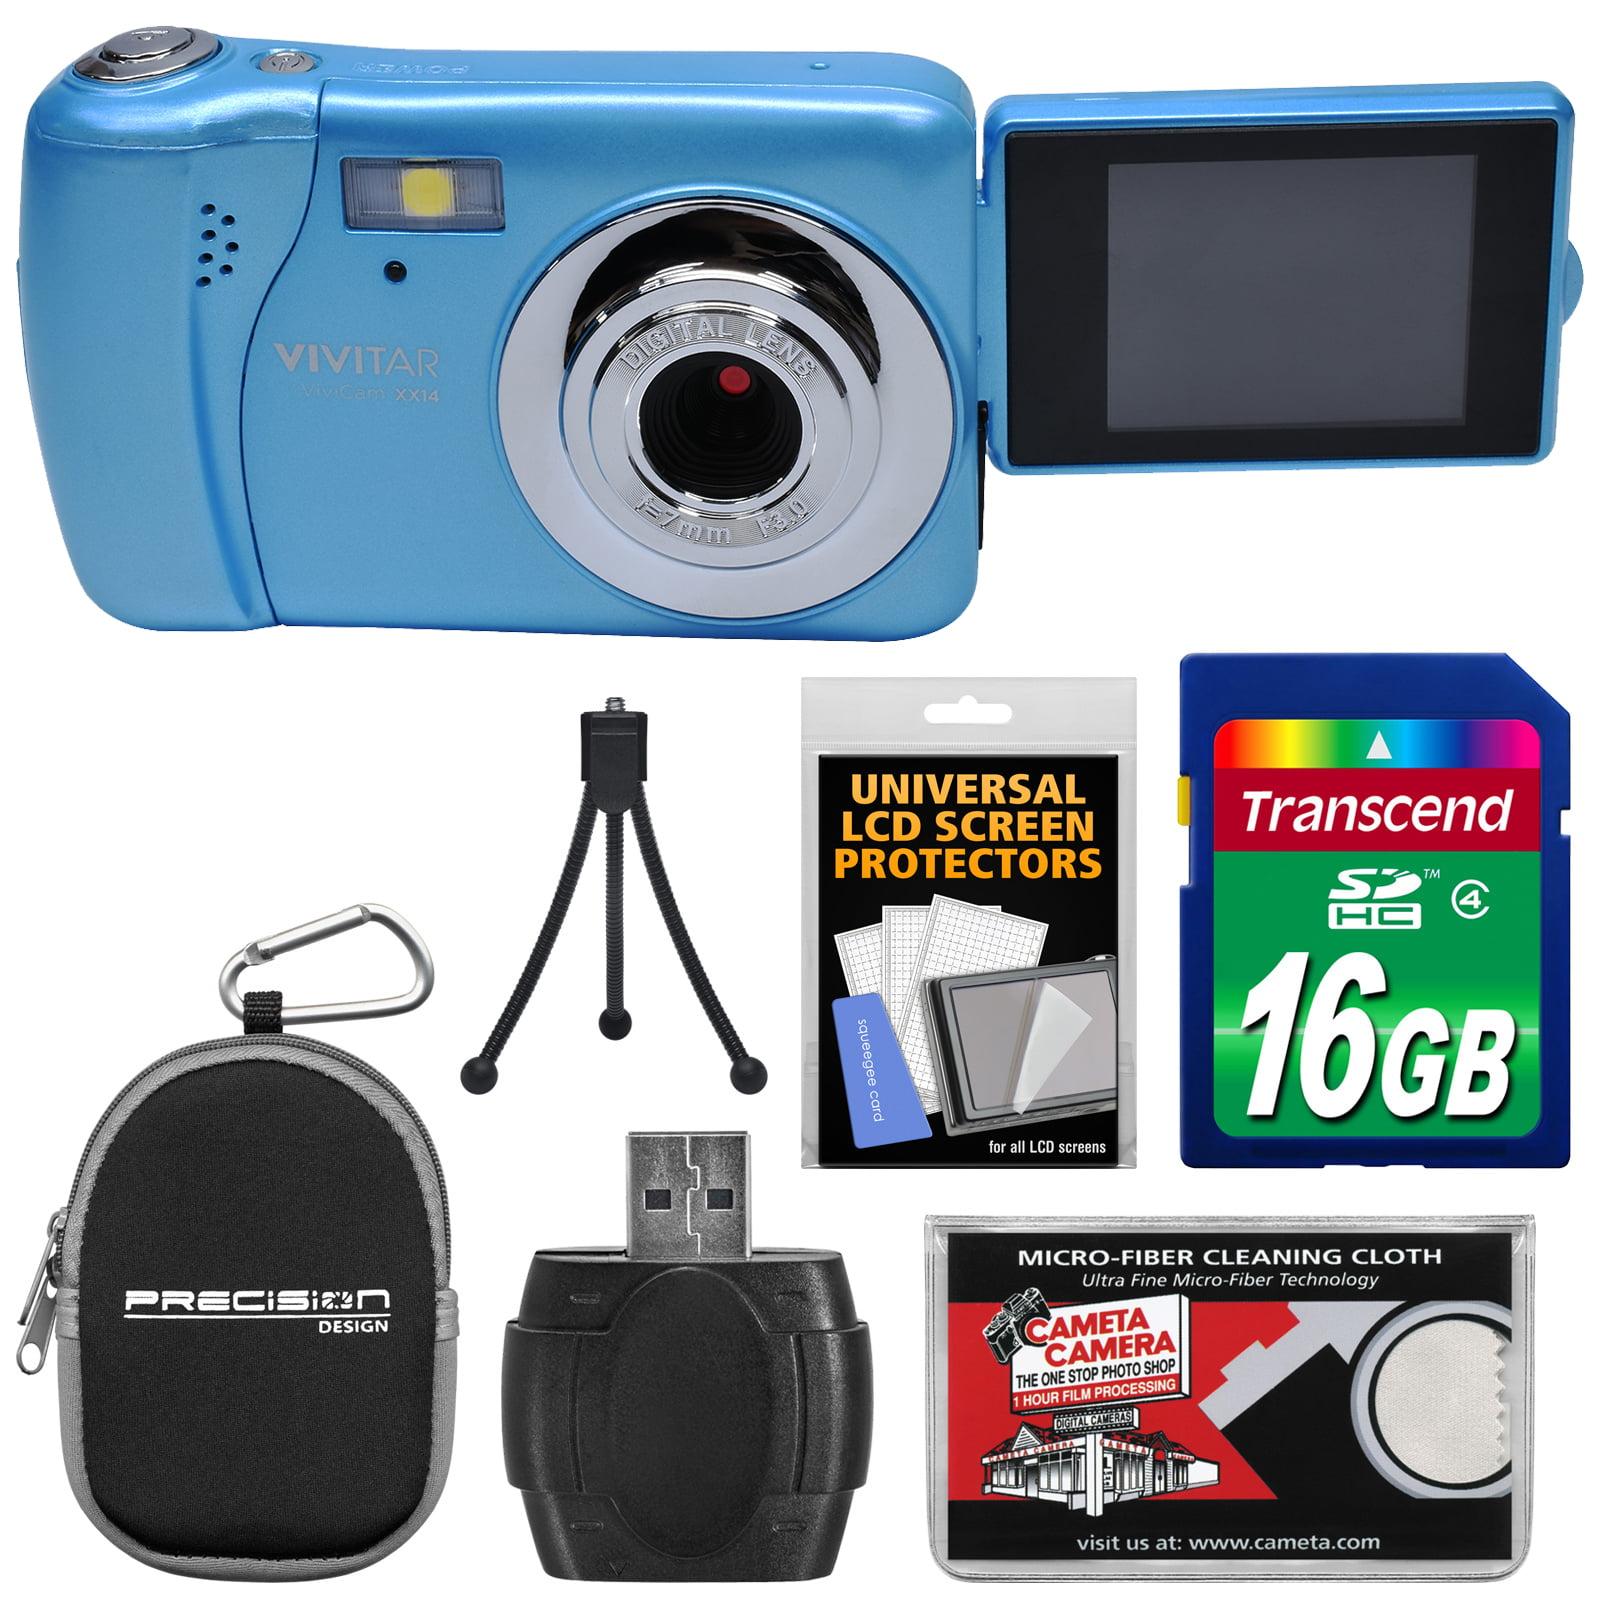 Vivitar ViviCam VXX14 Selfie Digital Camera (Blue) with 16GB Card + Case + Tripod + Reader + Kit by Vivitar